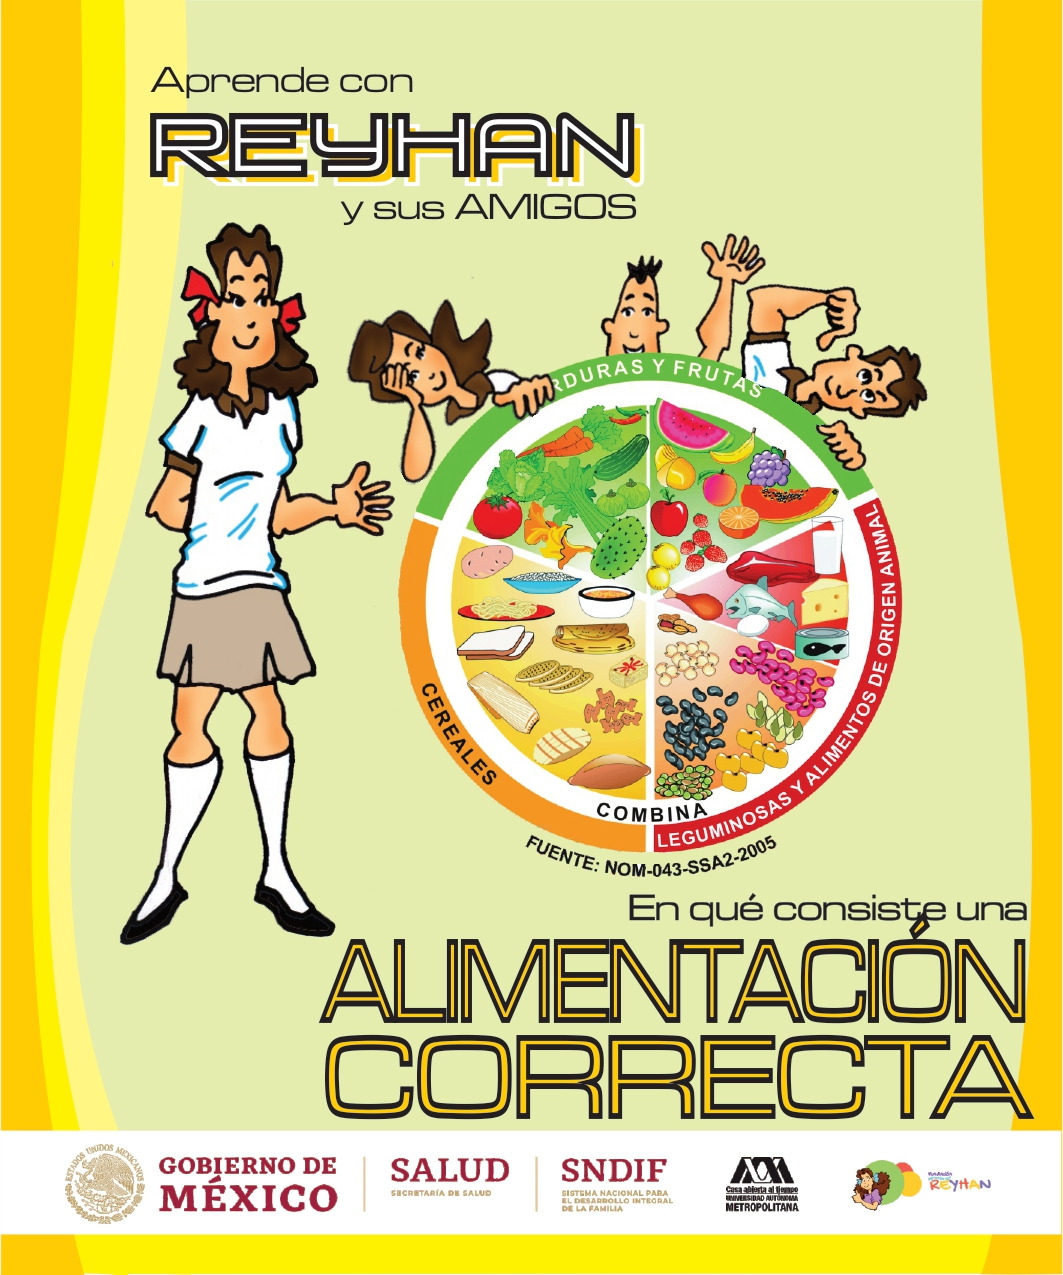 Alim recom Reyhan digital_page-0001